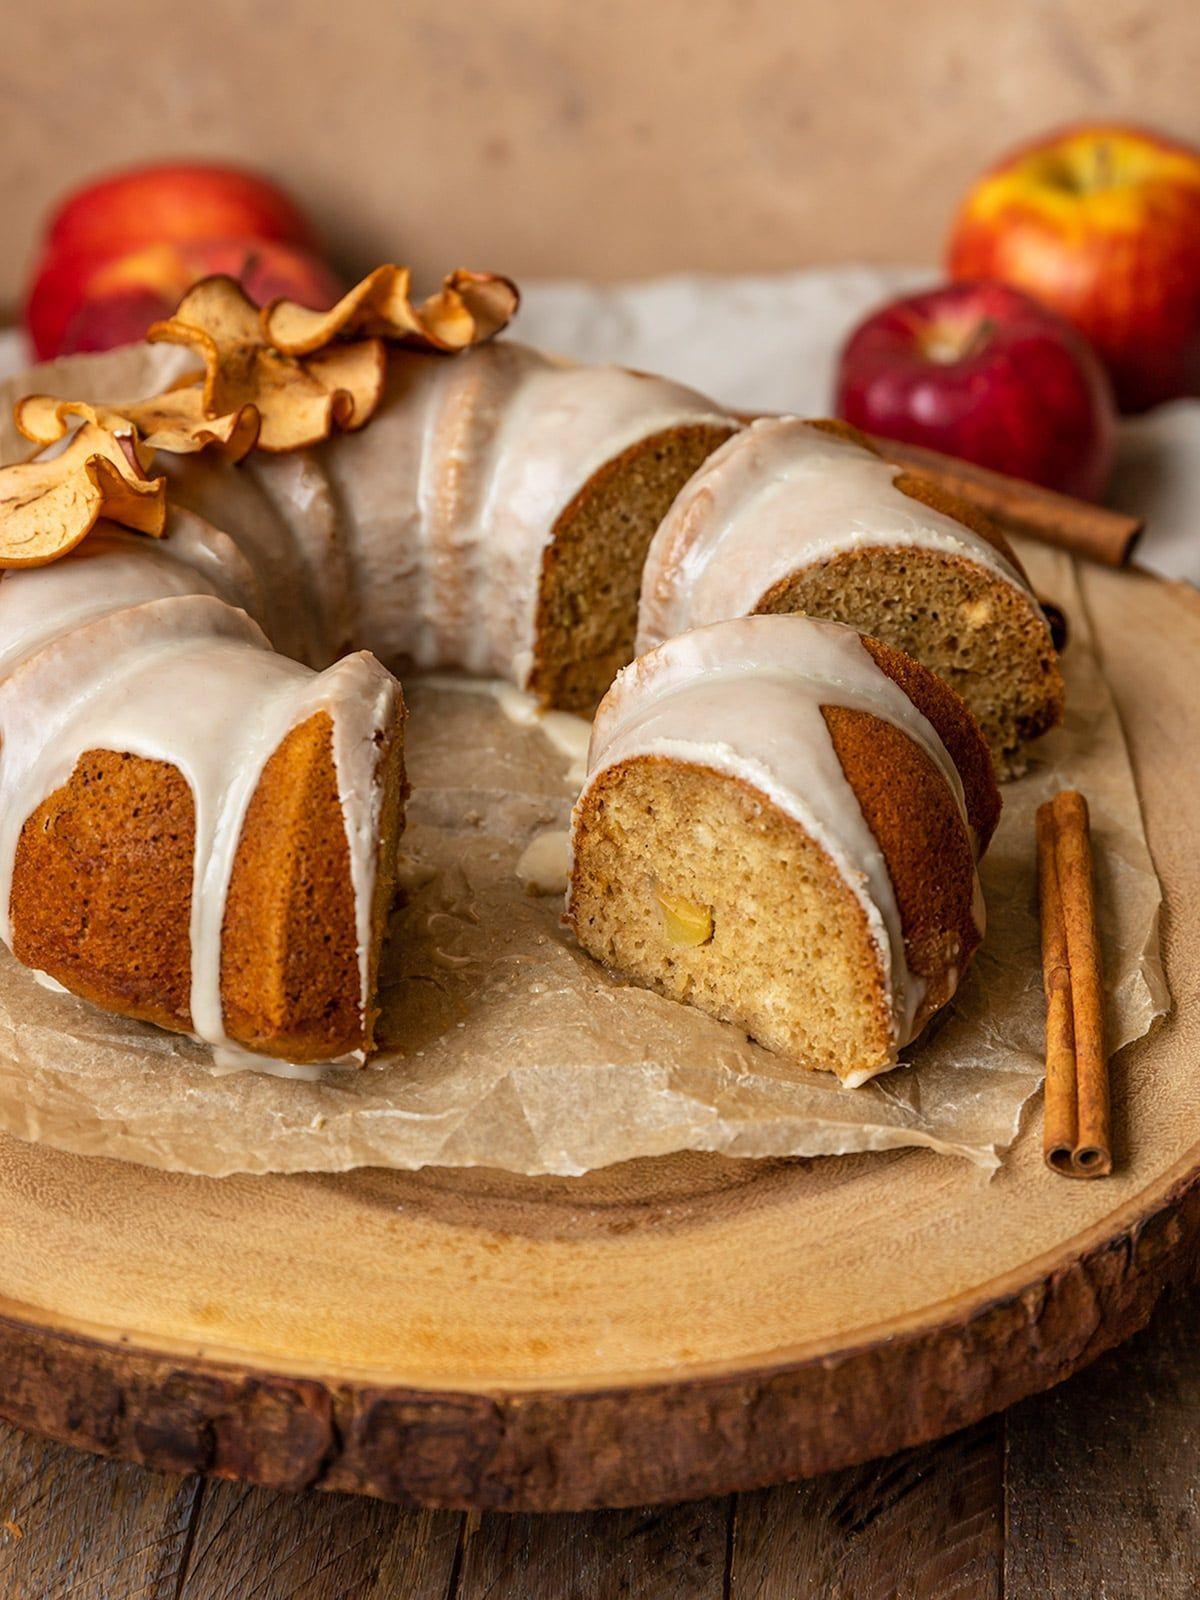 Vegan Apple Cider Bundt Cake In 2020 Apple Spice Cake Vegan Apple Cake Hannukah Recipes